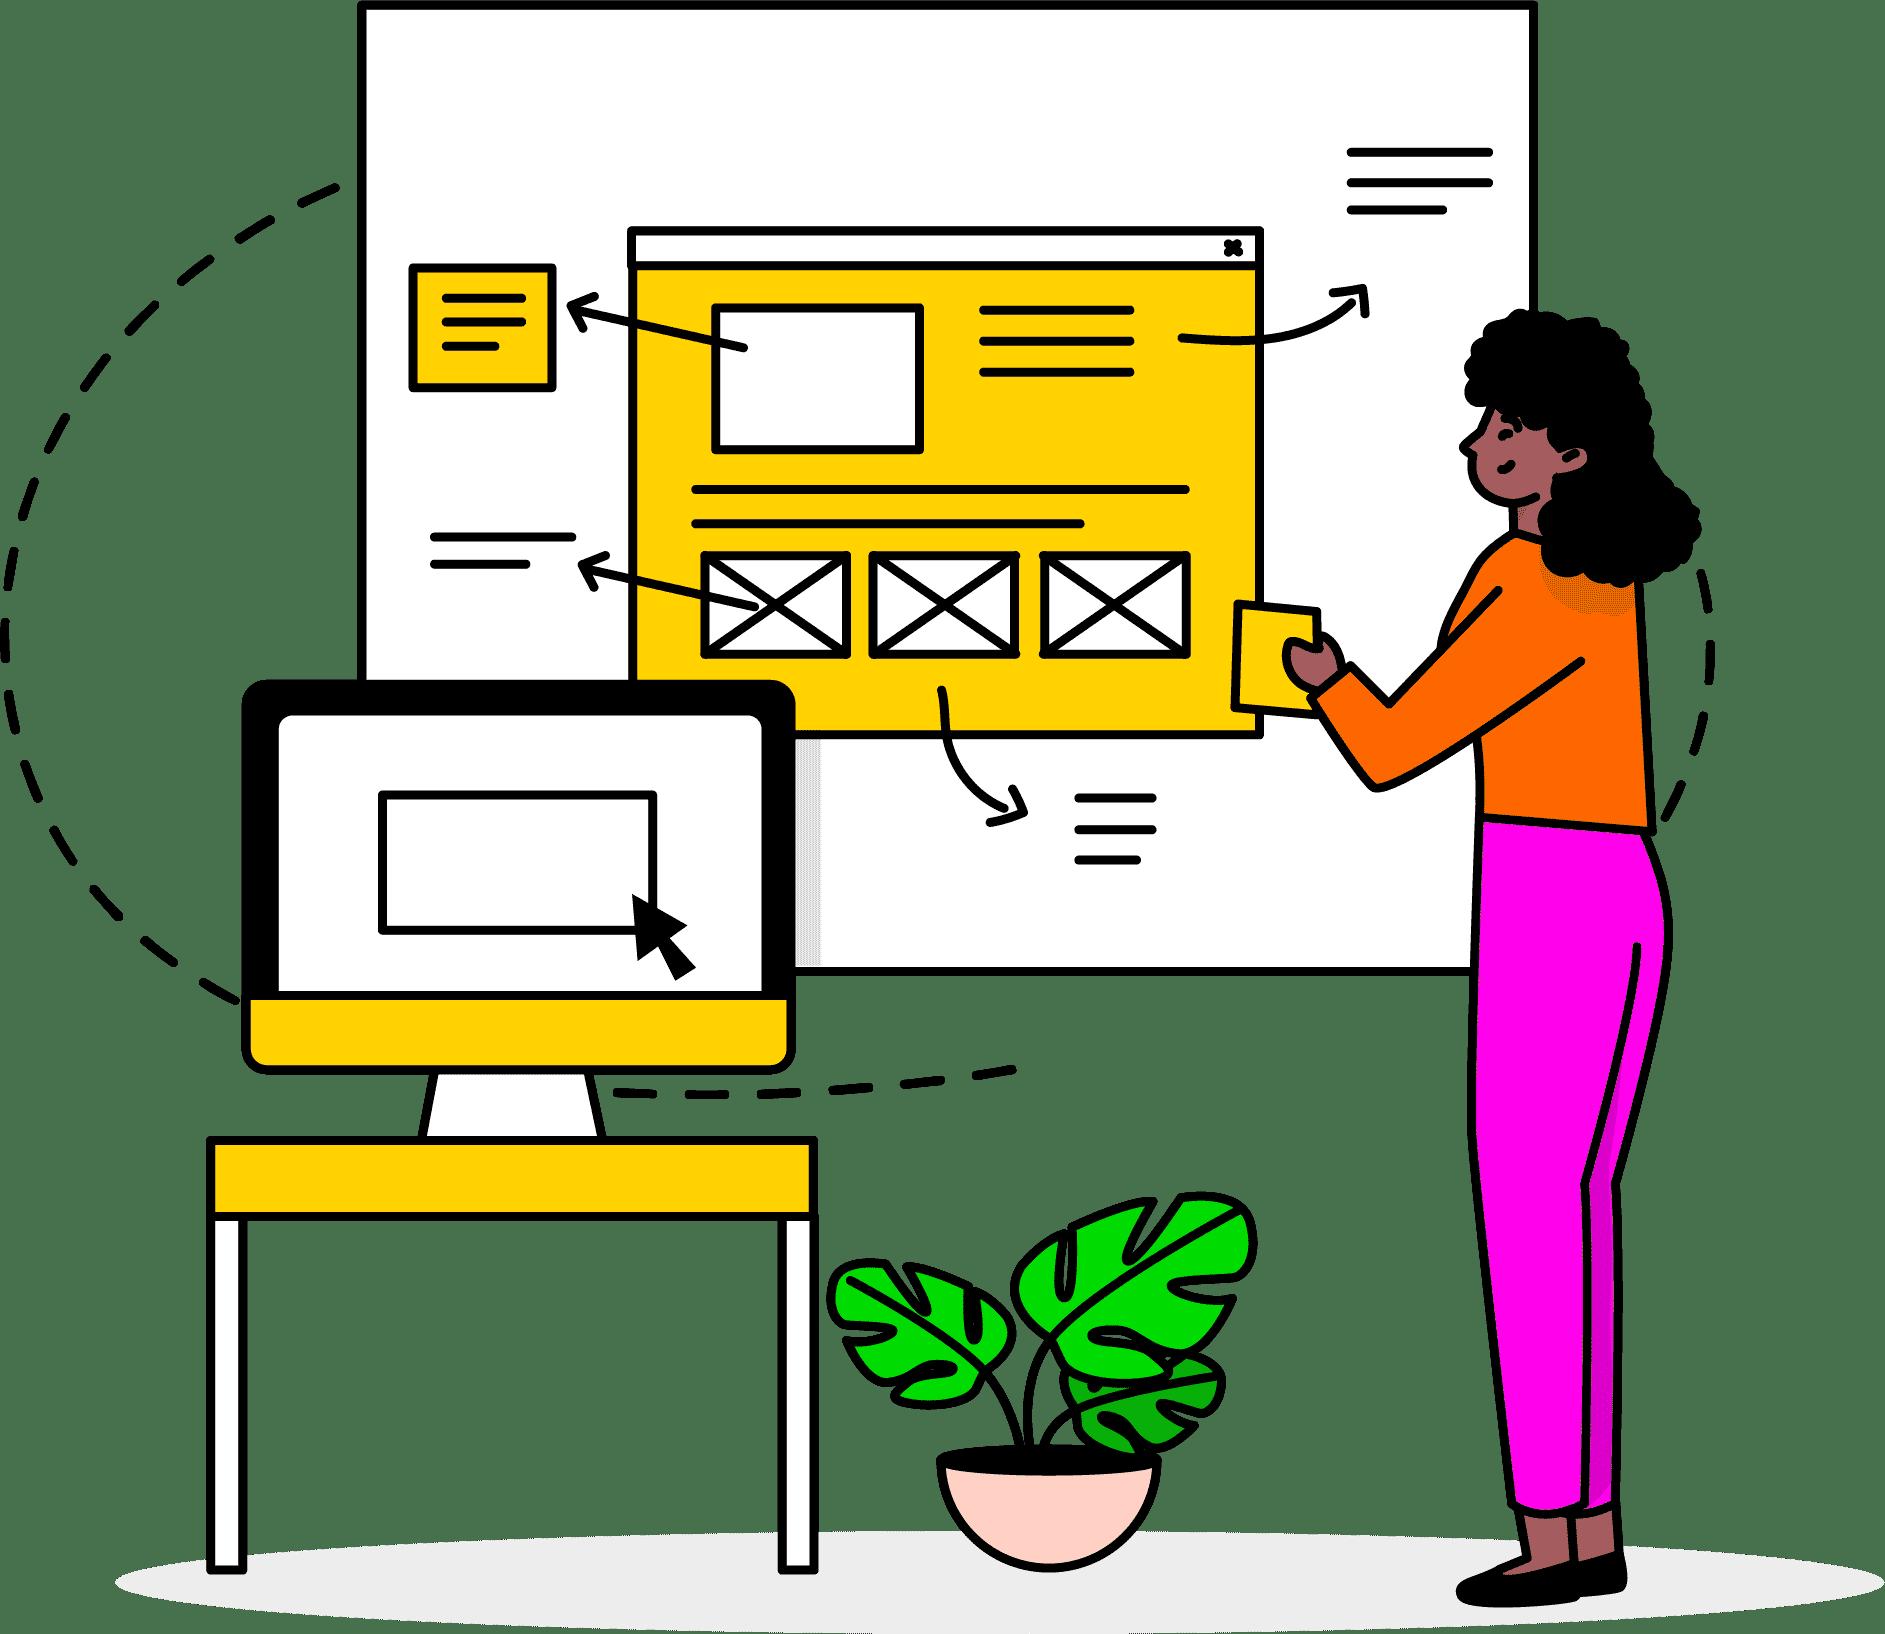 Web Application Services Image